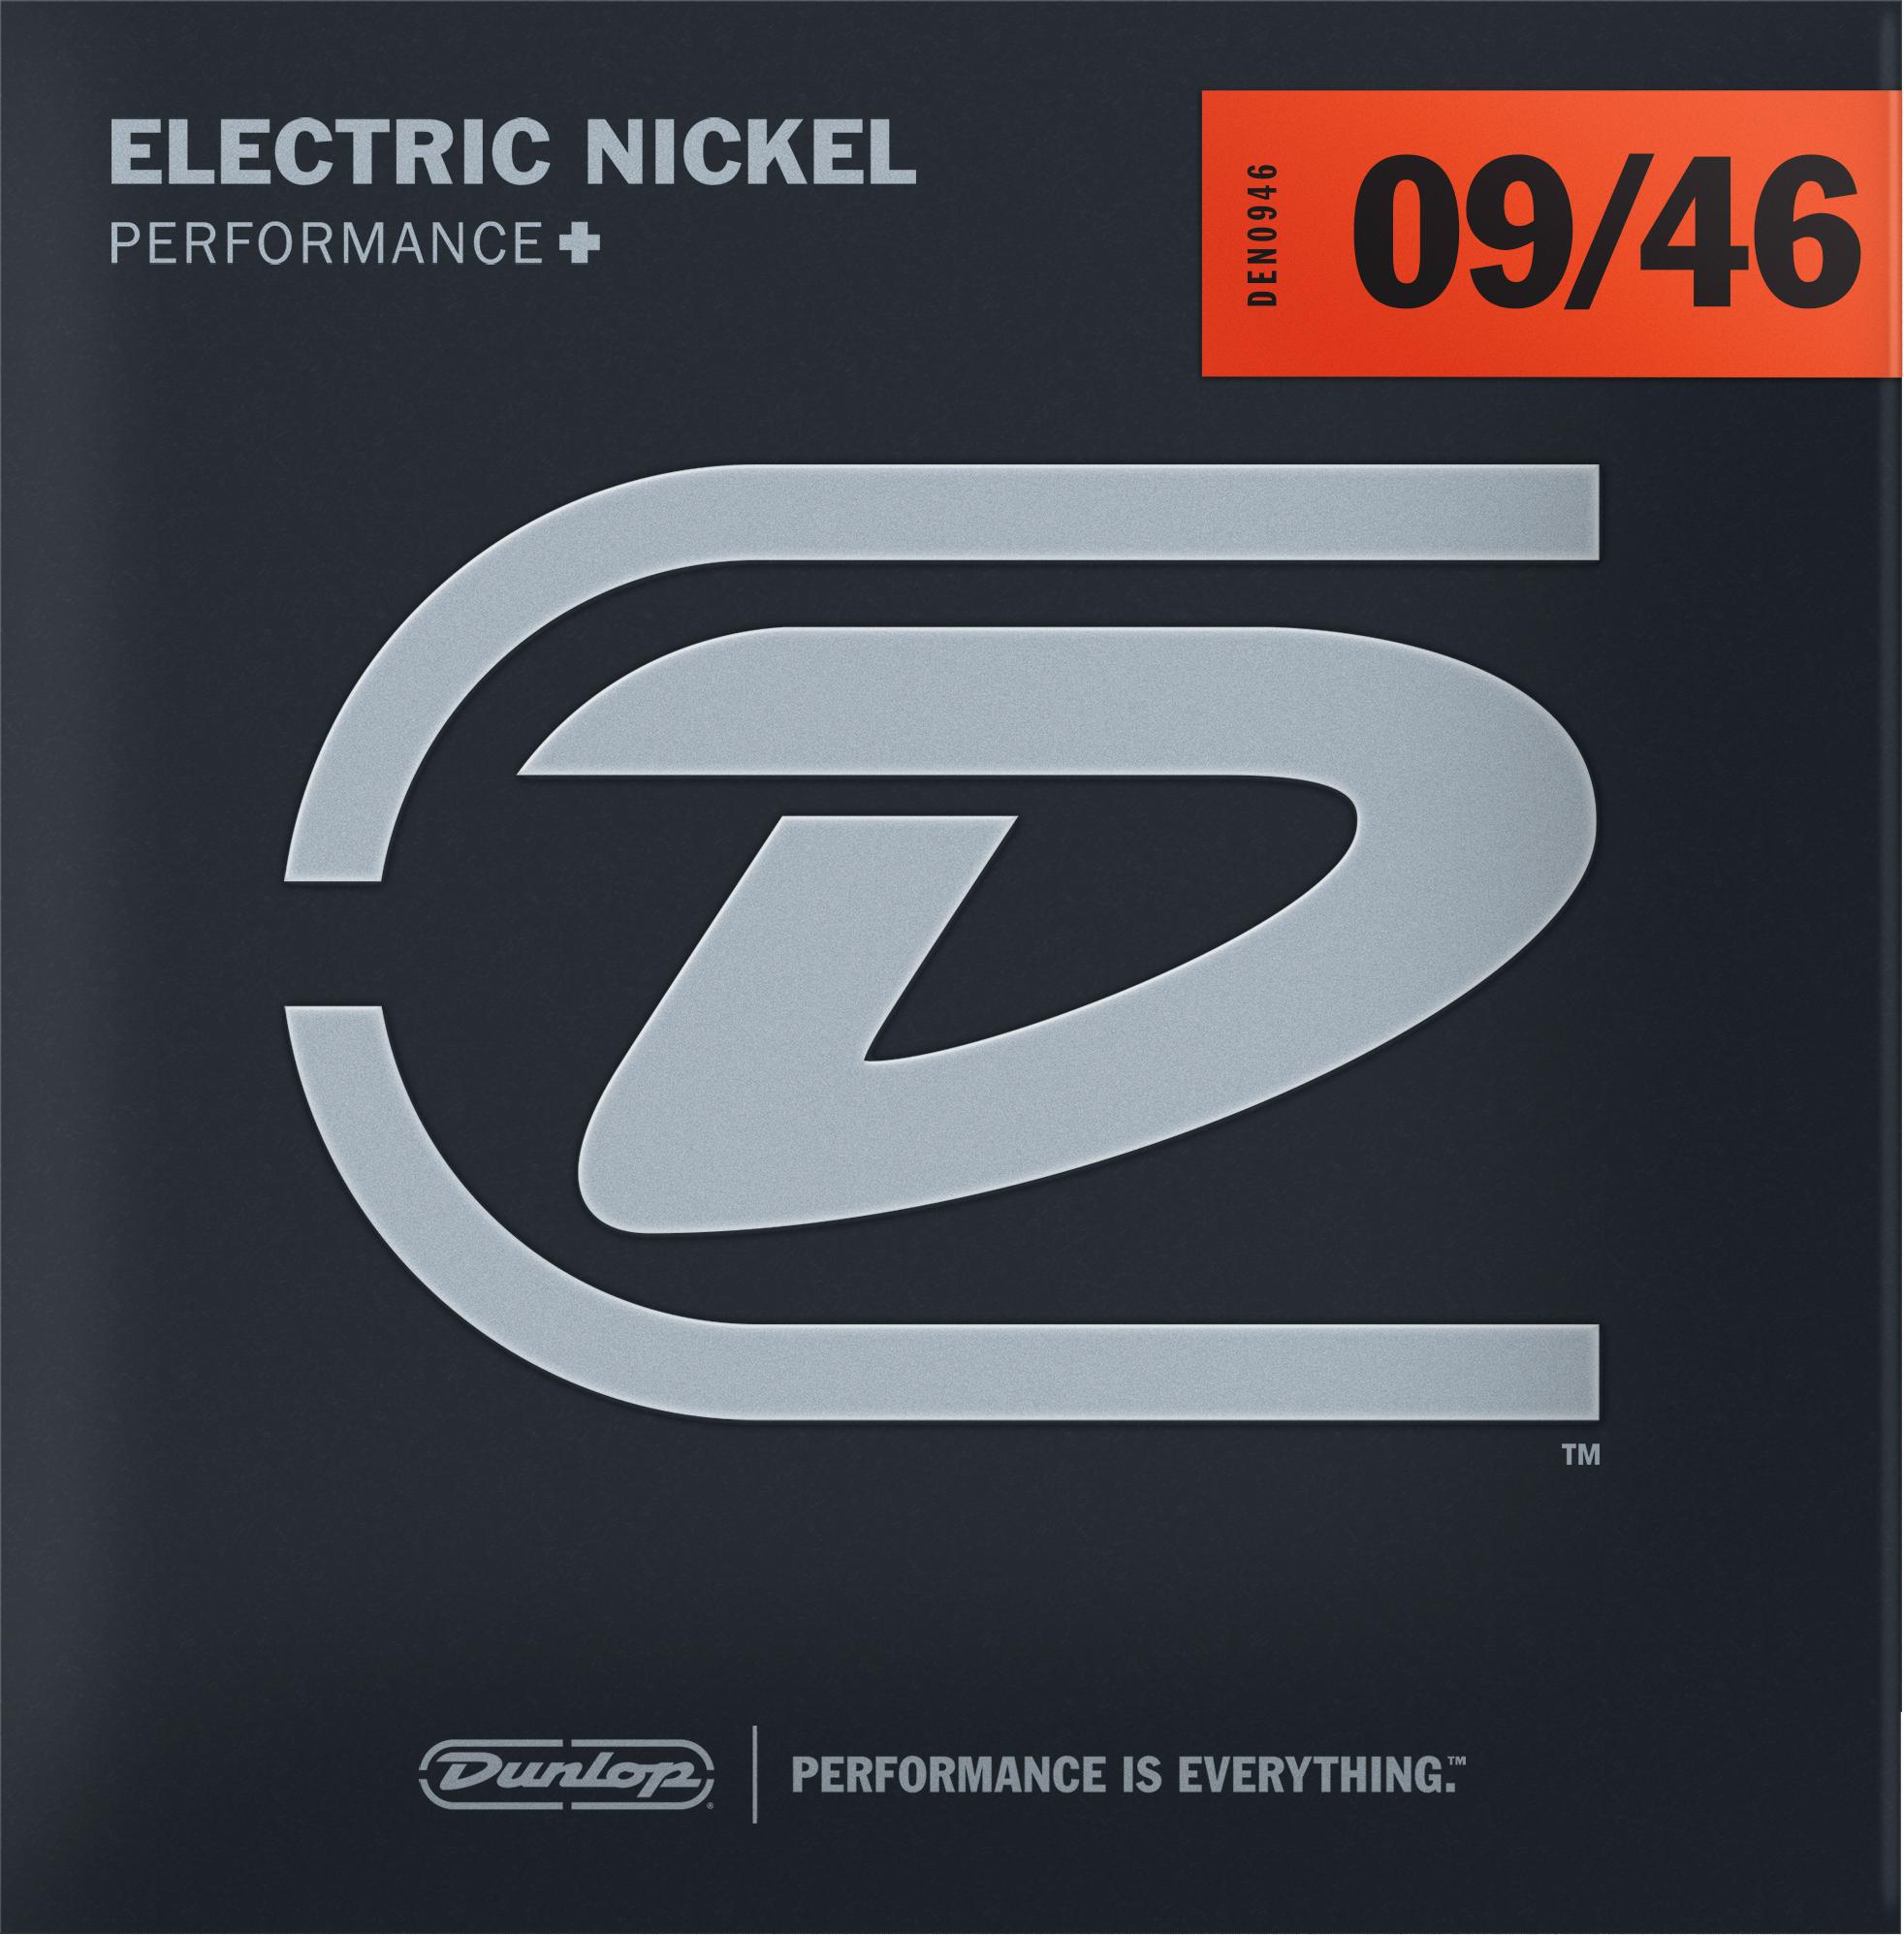 Electric Nickel 9/46